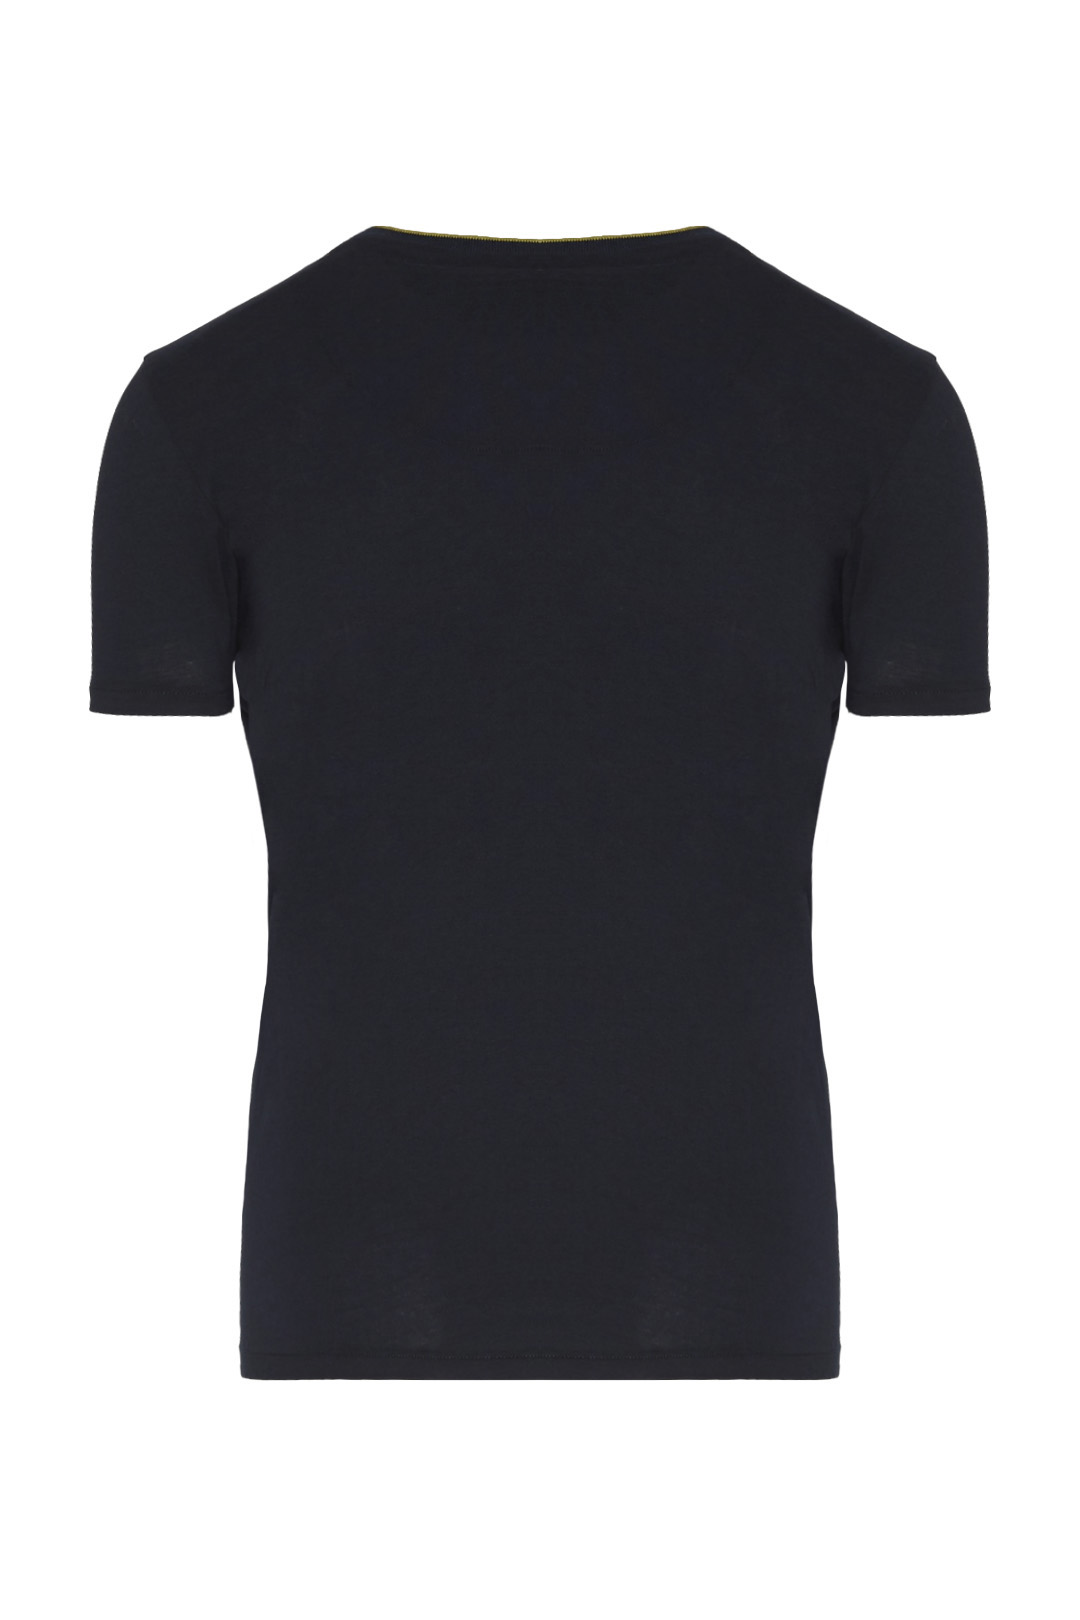 Short-sleeved printed cotton t-shirt     2